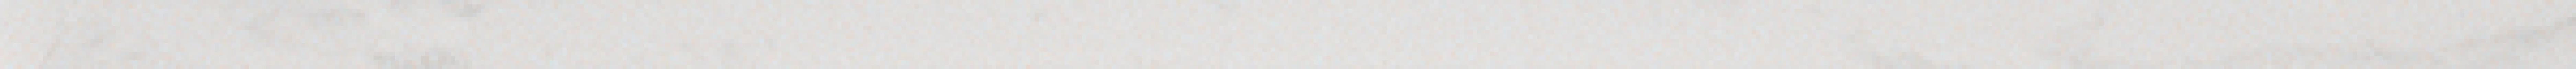 Бордюр Fap Ceramiche Frame Desert Wall Silver Listello. 1.5x56 fKRI